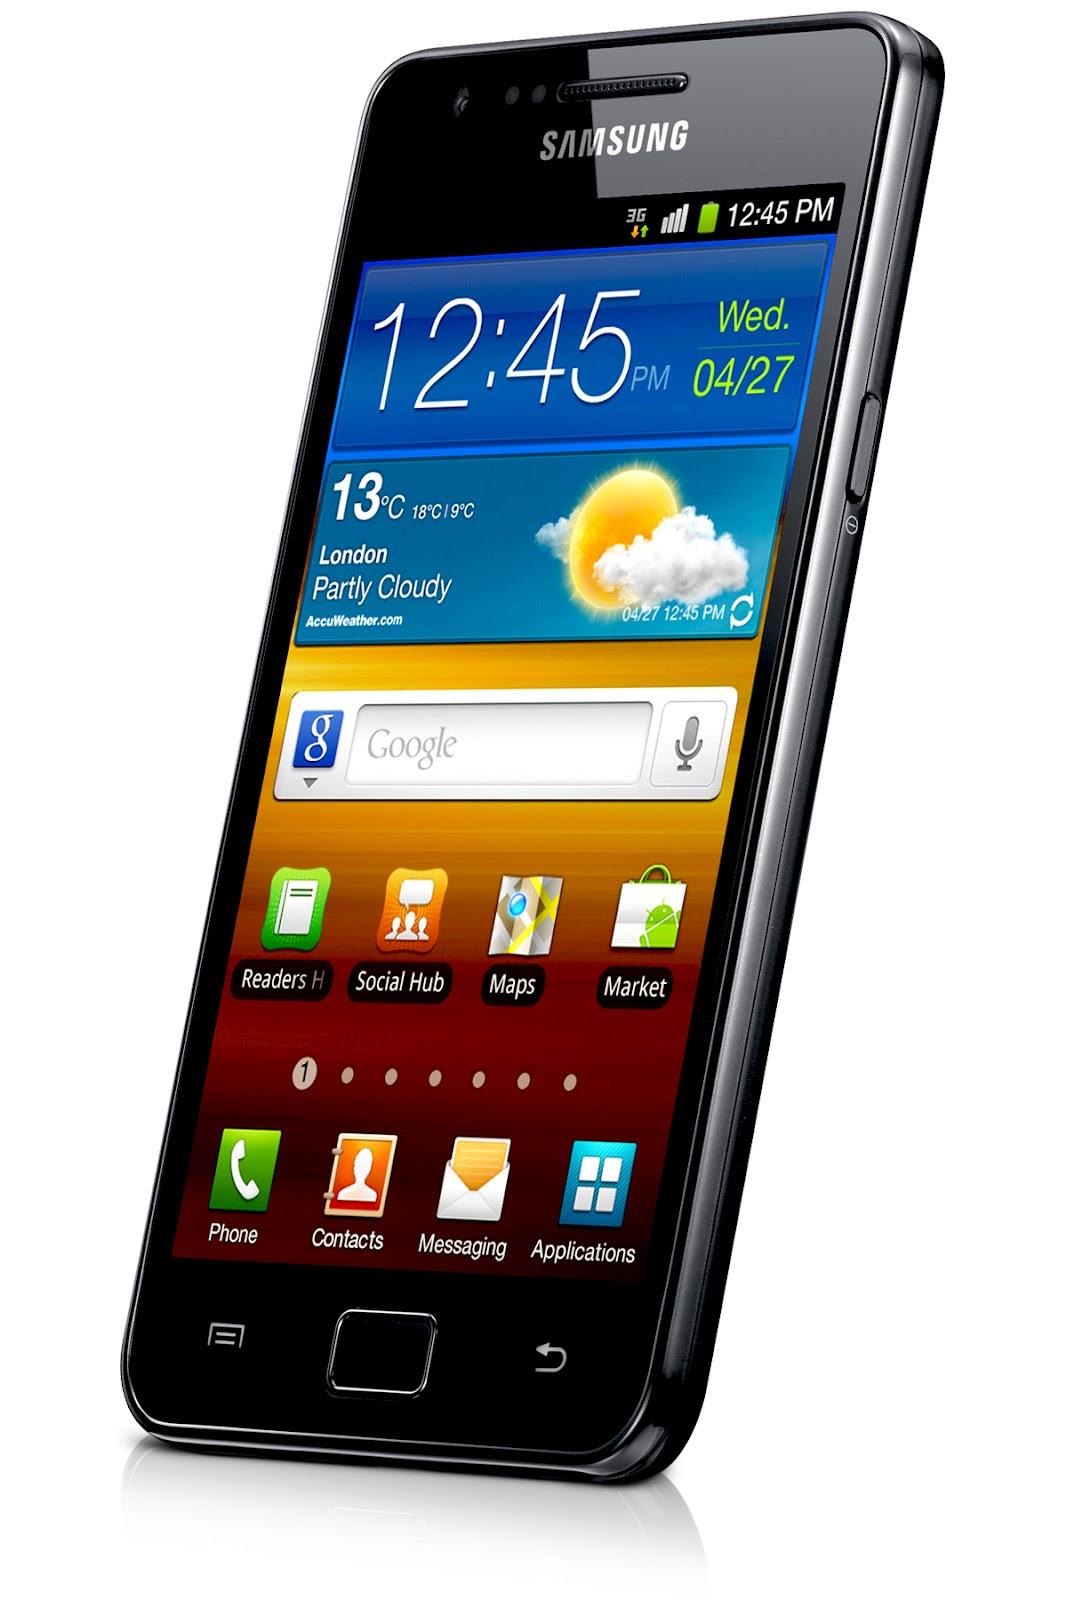 http://1.bp.blogspot.com/-96g384Veau8/UGH7PDA7D4I/AAAAAAAACP0/67jzspLrmQ4/s1600/Samsung%20Galaxy%20S2%20-%20Tekno%20Note%20(7).jpg